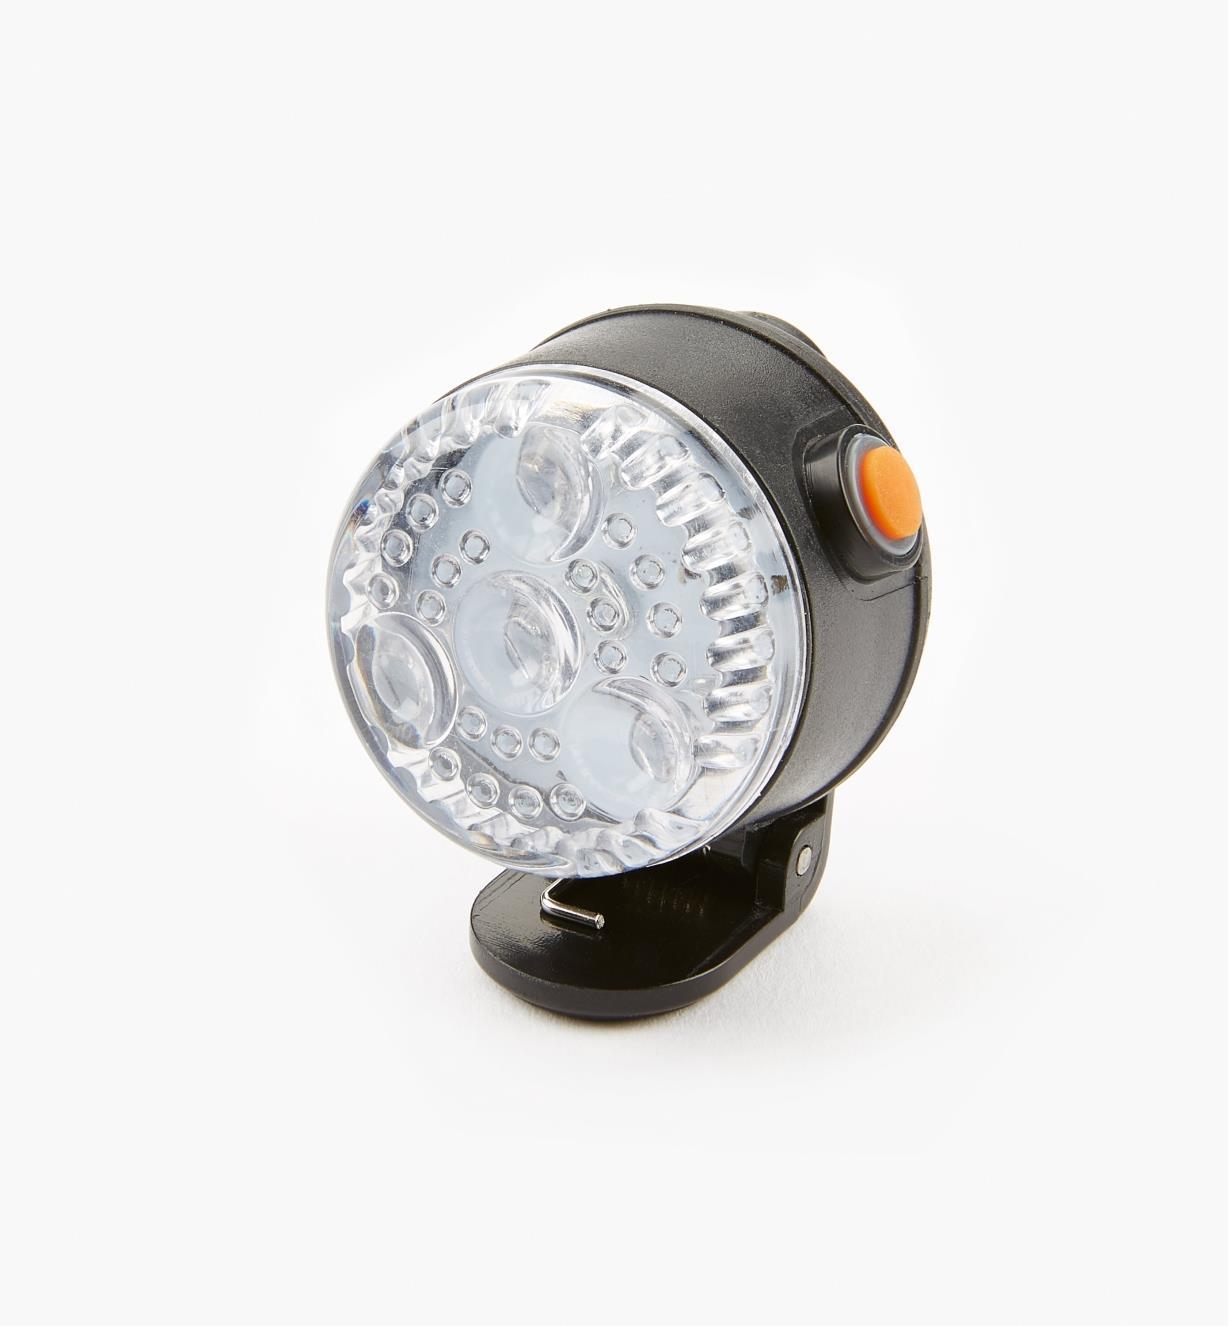 68K0905 - LED Clip Light, Clear